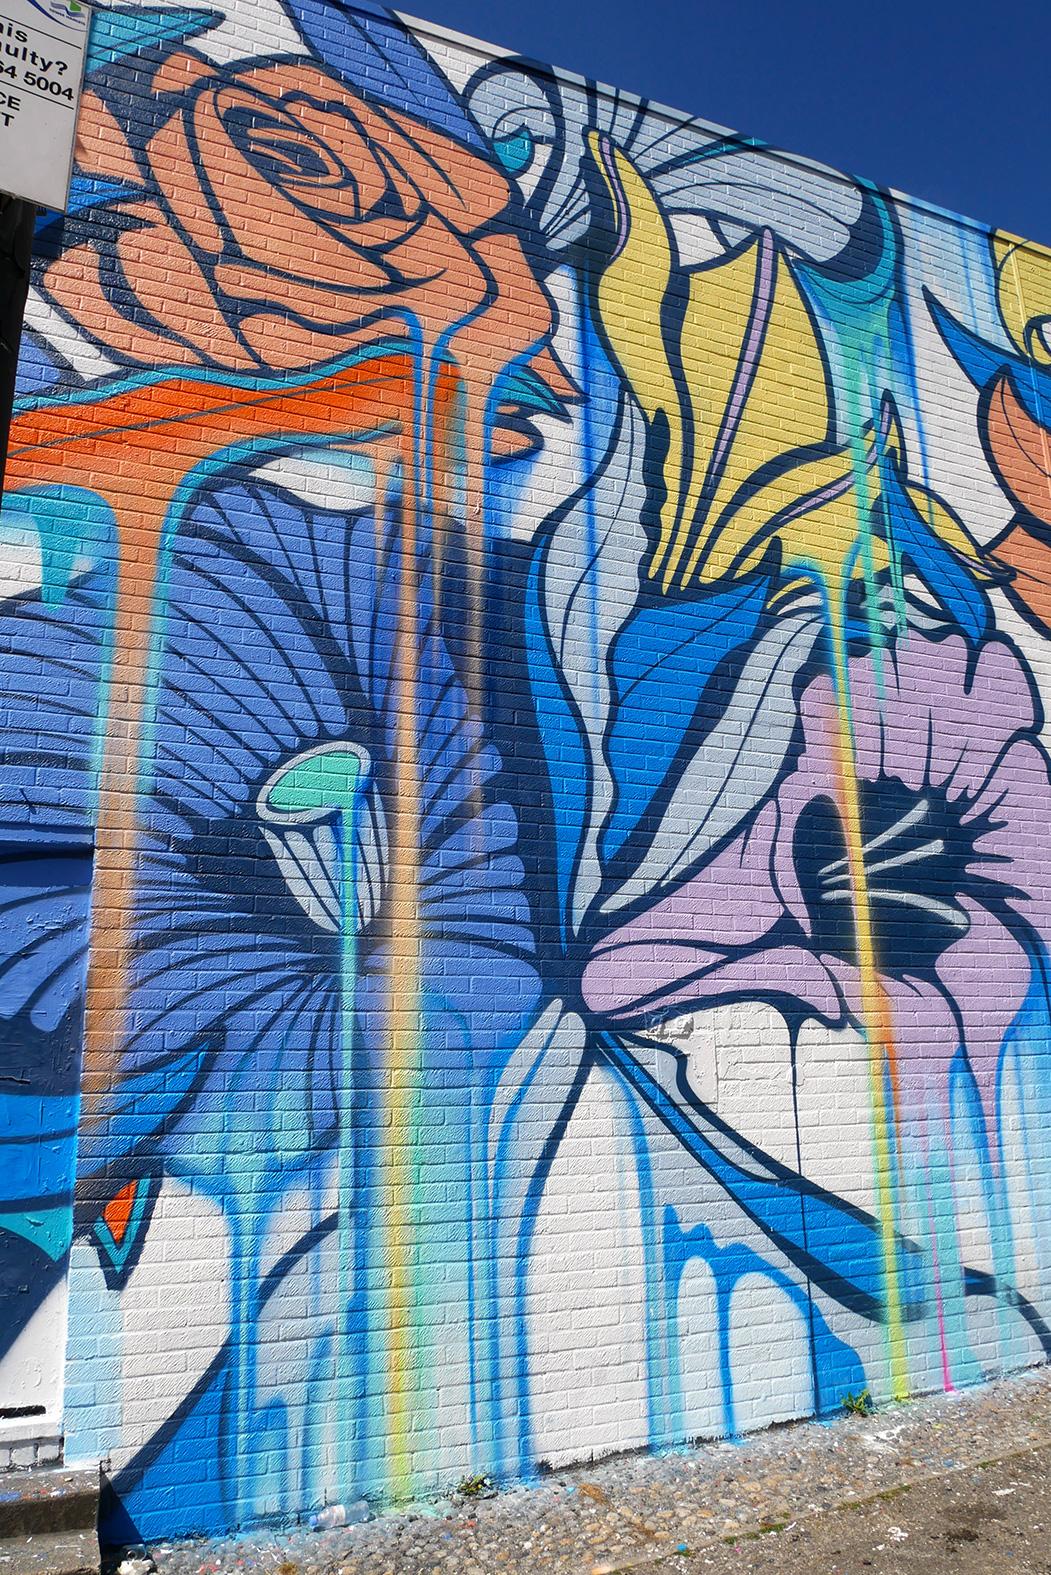 Nerone-mural-chance-street-20